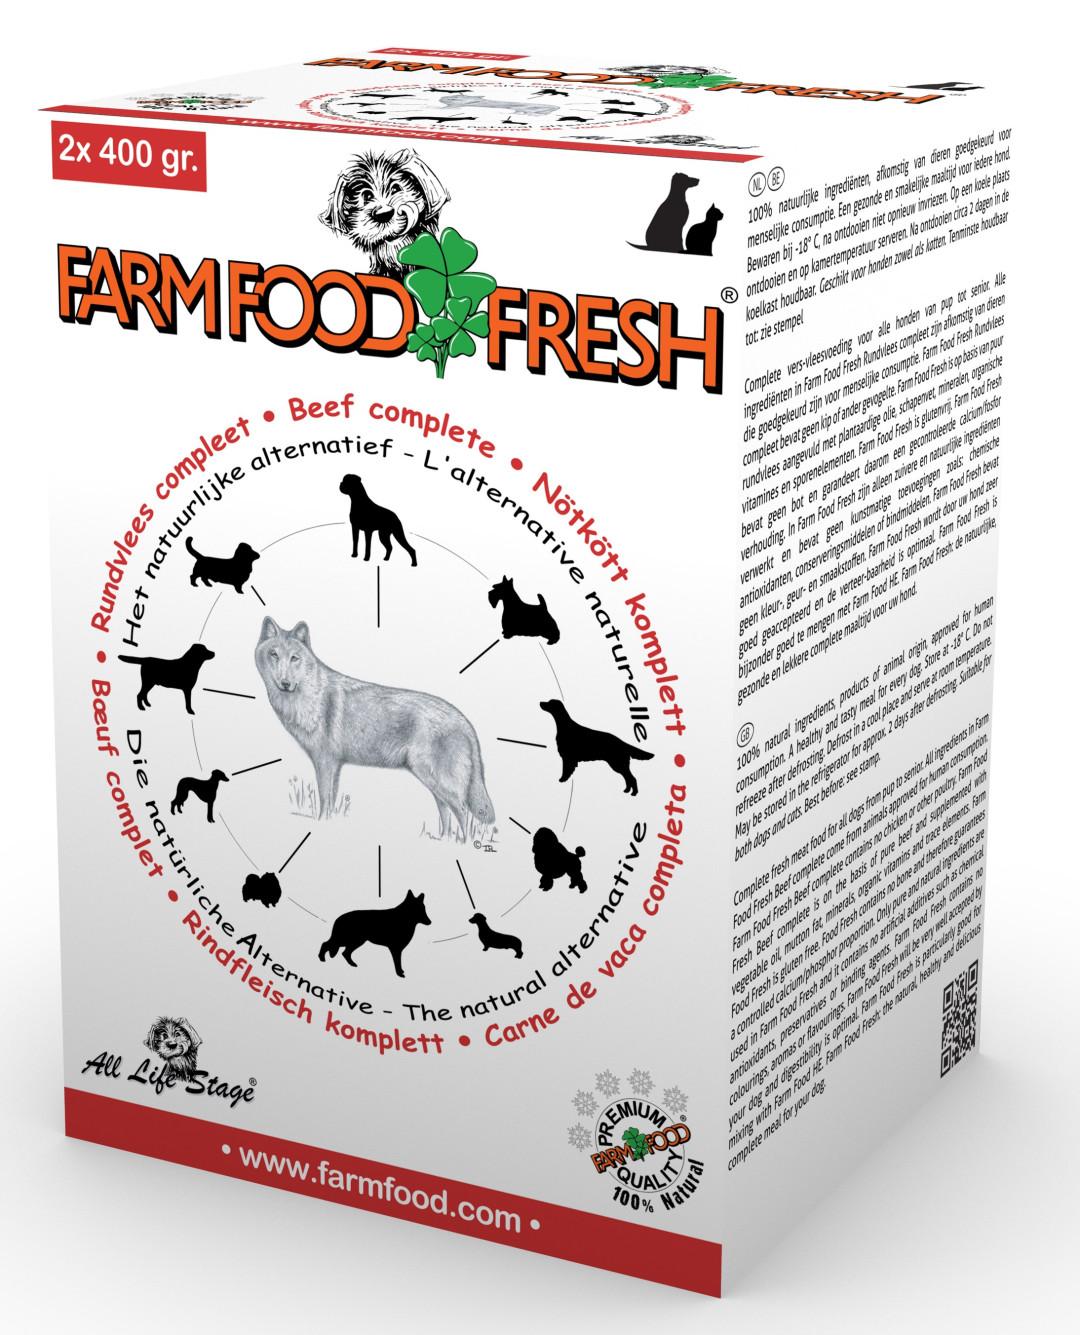 Farm Food Fresh hondenvoer rundvlees compleet 2 x 400 gr